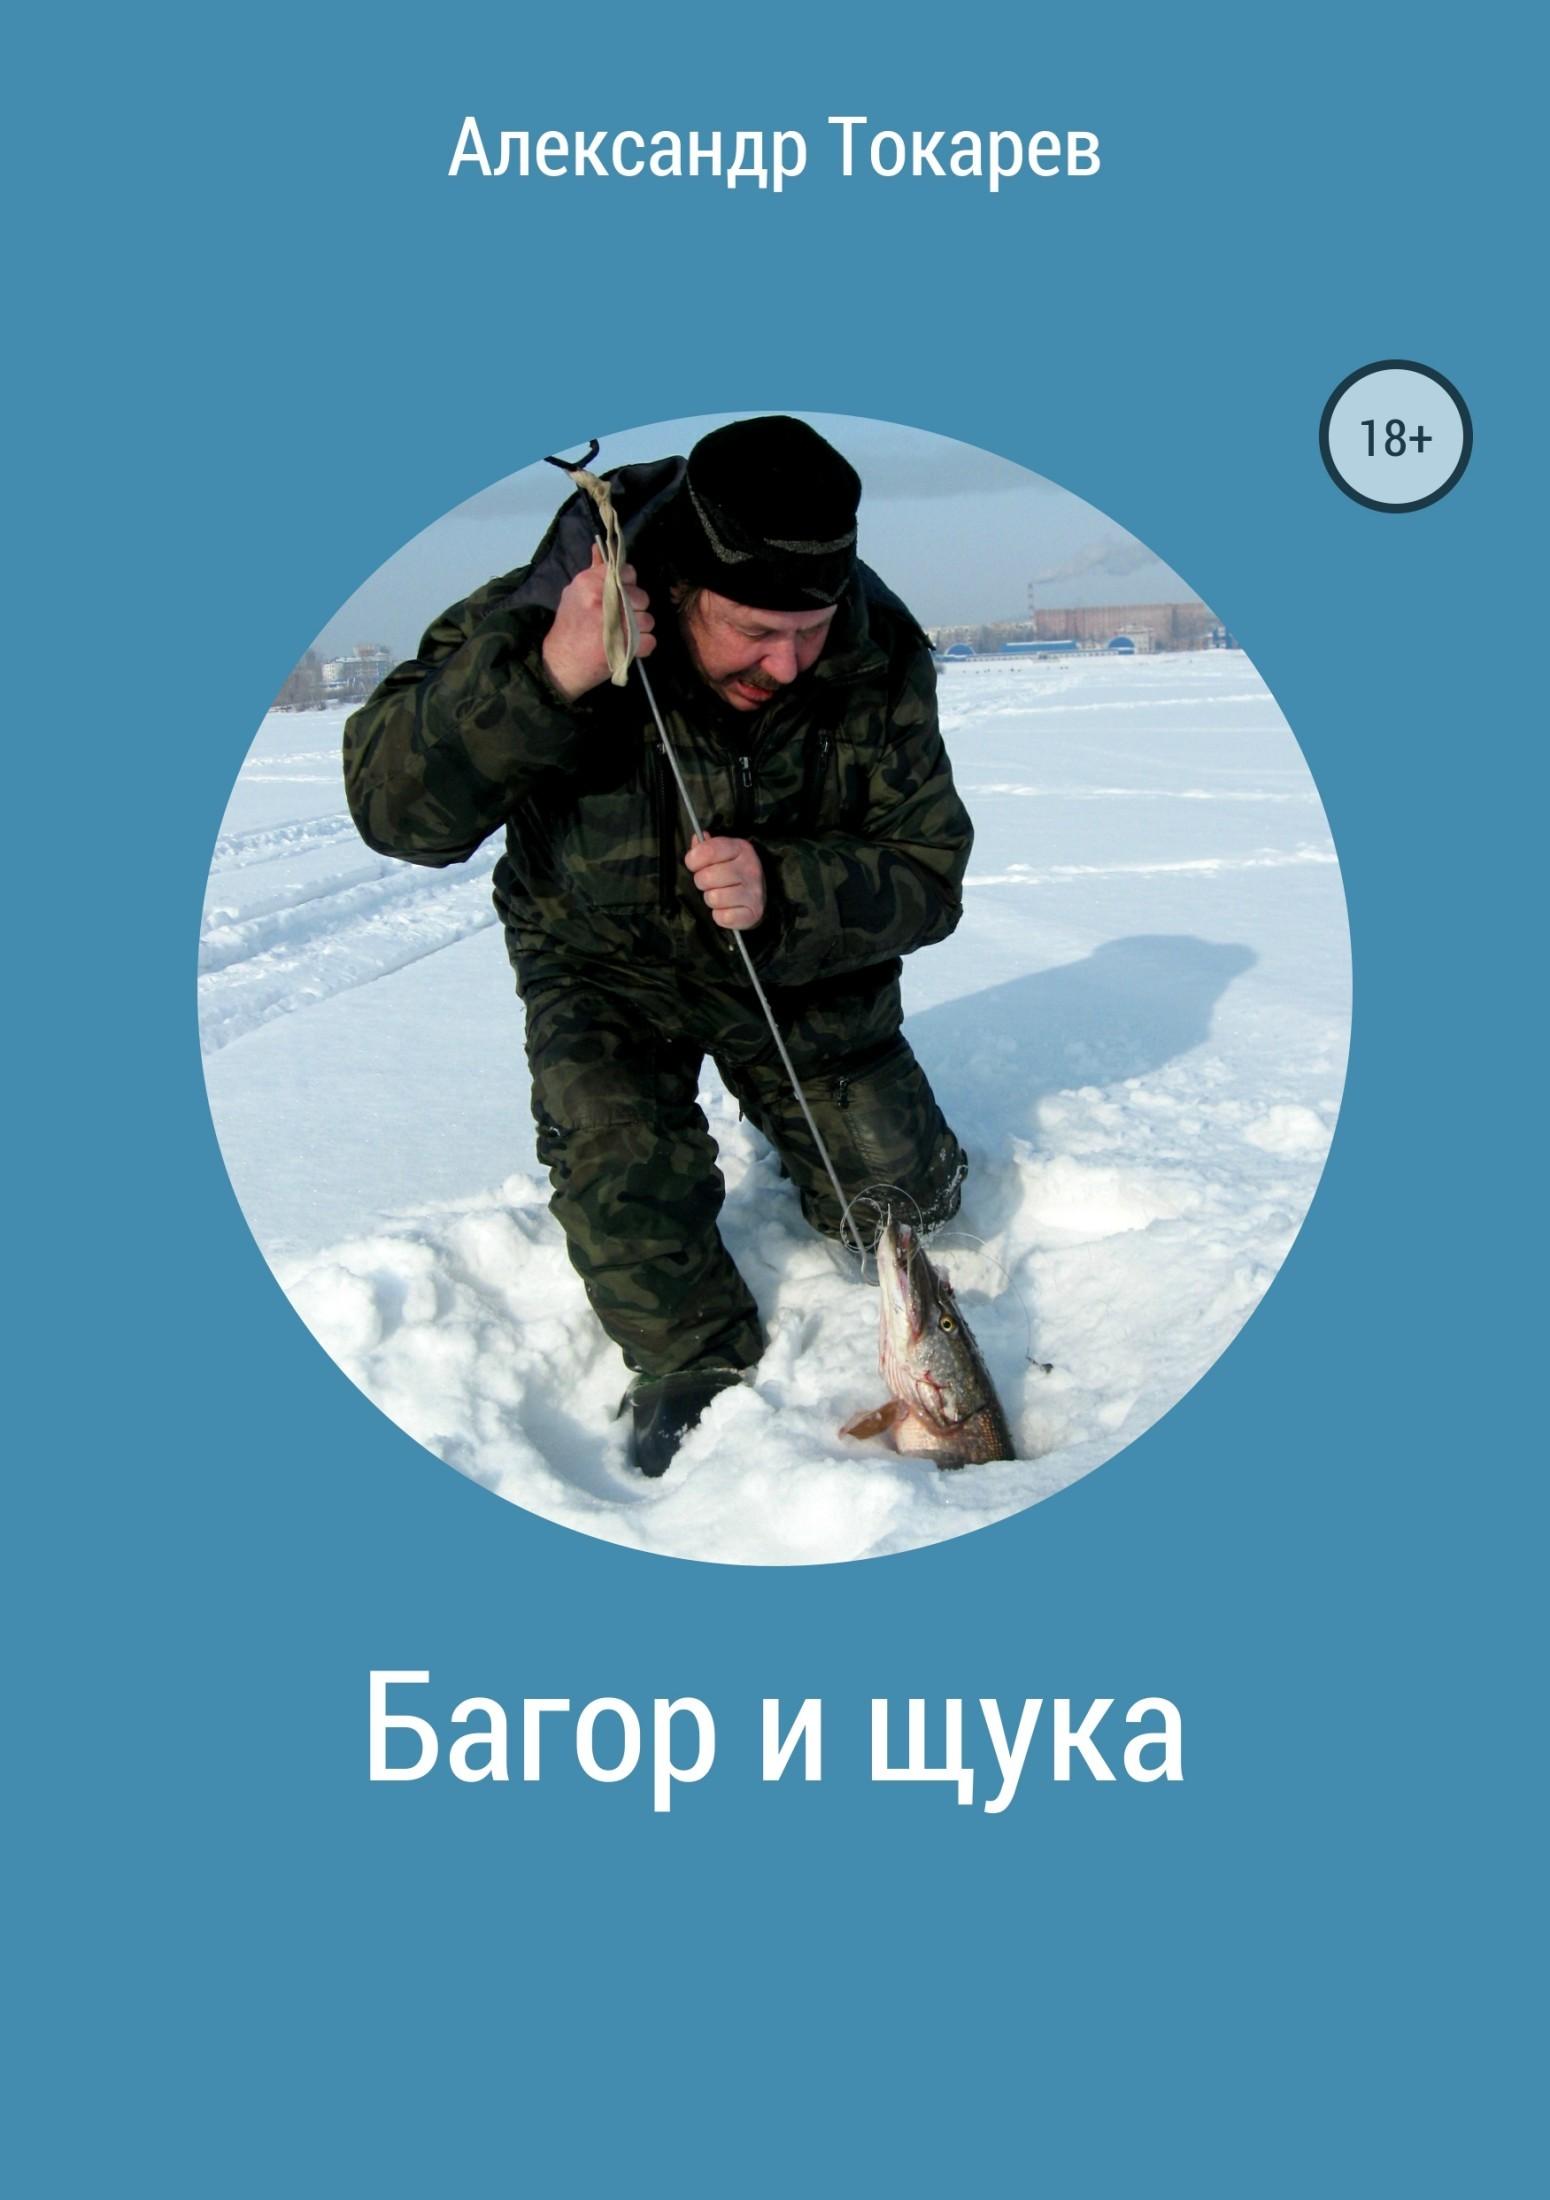 Александр Владимирович Токарев бесплатно